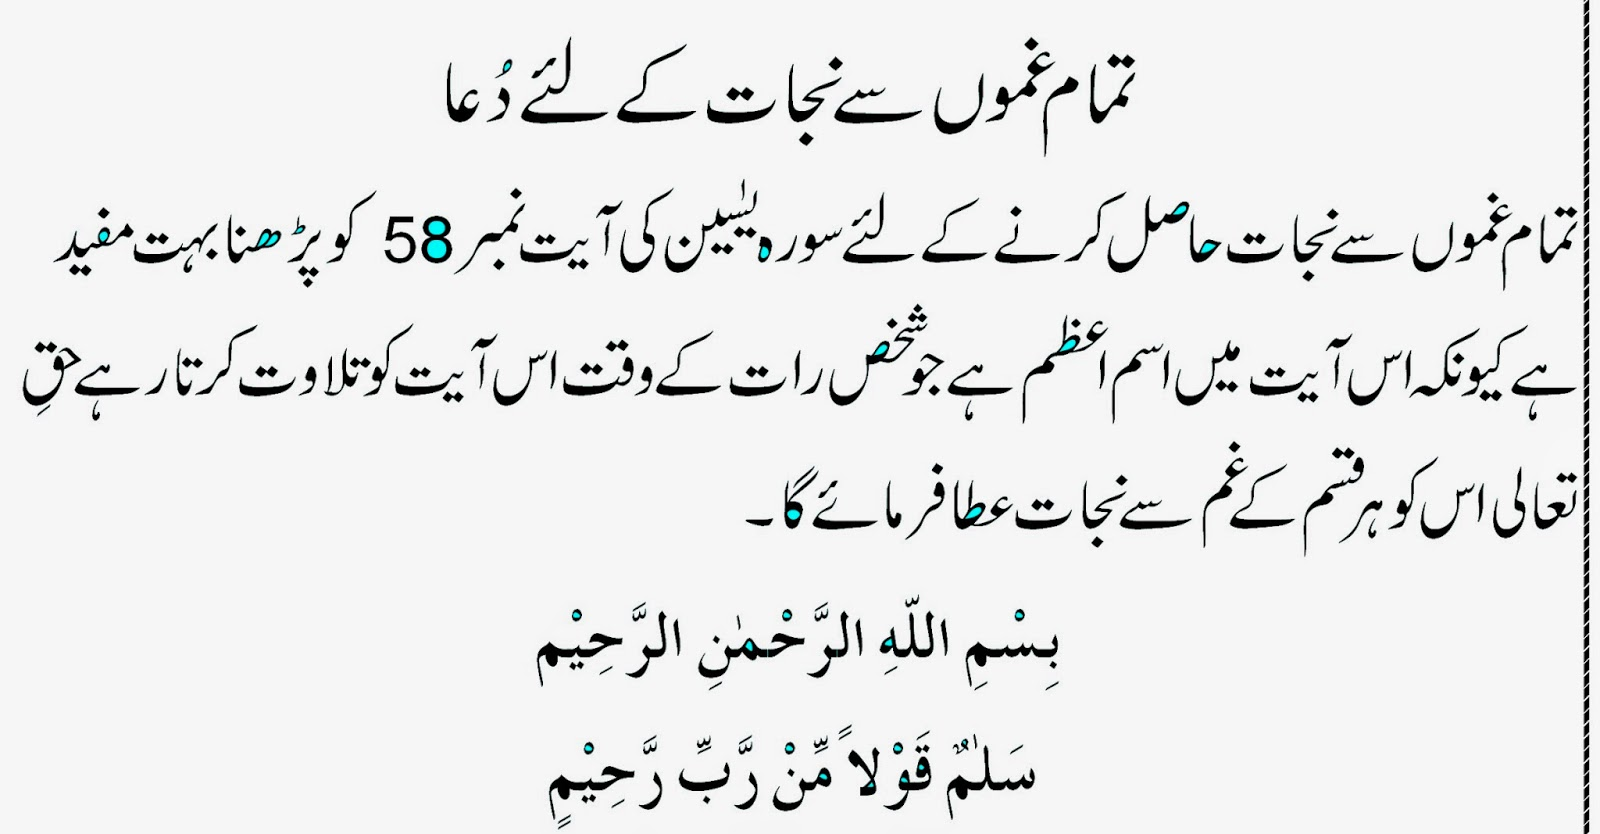 Tamam Ghamo Say Nijat K Liye Qurani Dua